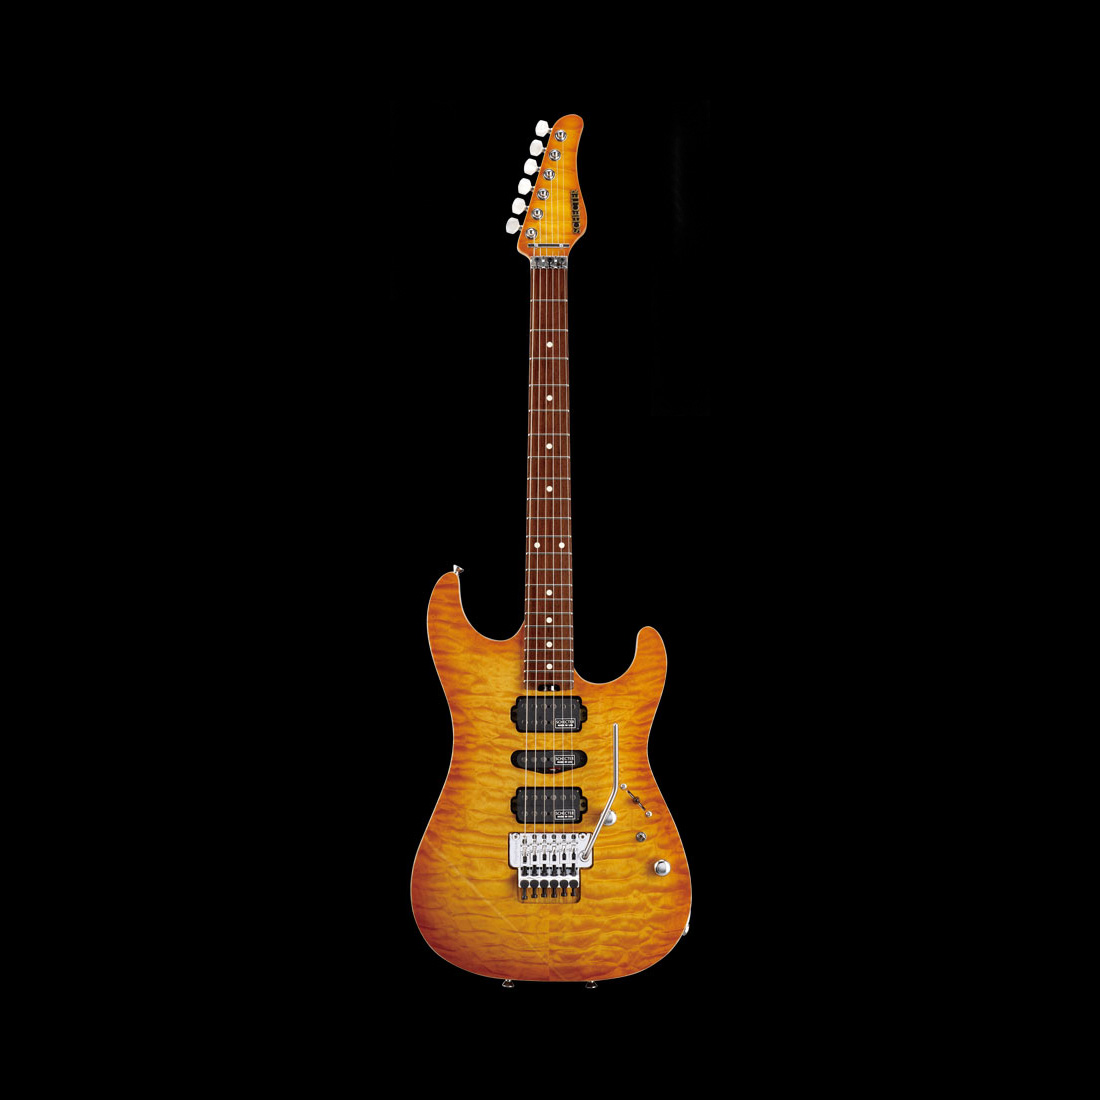 Schecter / EX-V-22-CTM-FRT R/NPG 4A Lemon Drop Sunburst シェクター エレキギター 《受注生産:予約受付中》